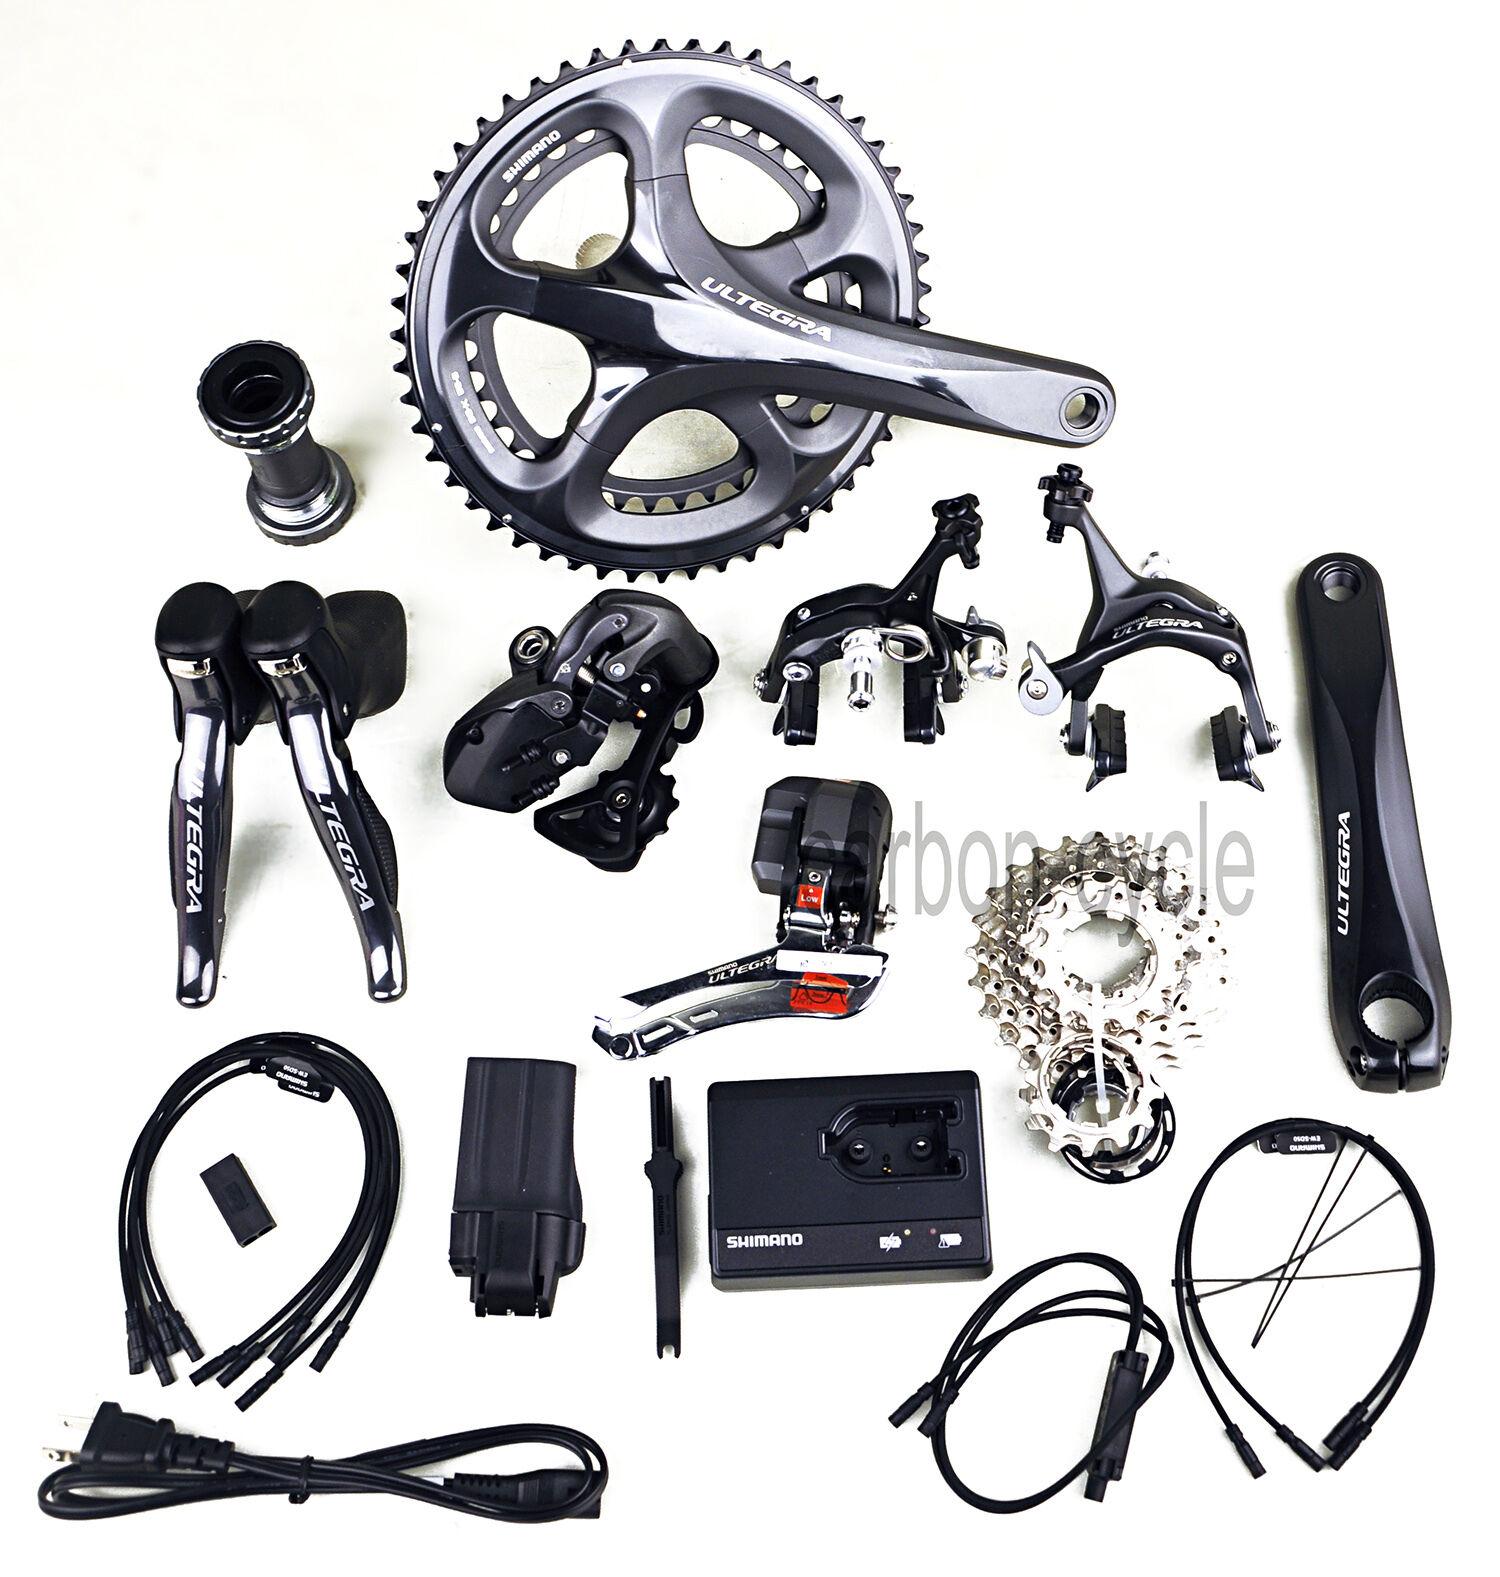 6770 Groupset Shimano Ultegra Di2 Electronic Kit Road Bicycle 170&172.5&175 10s